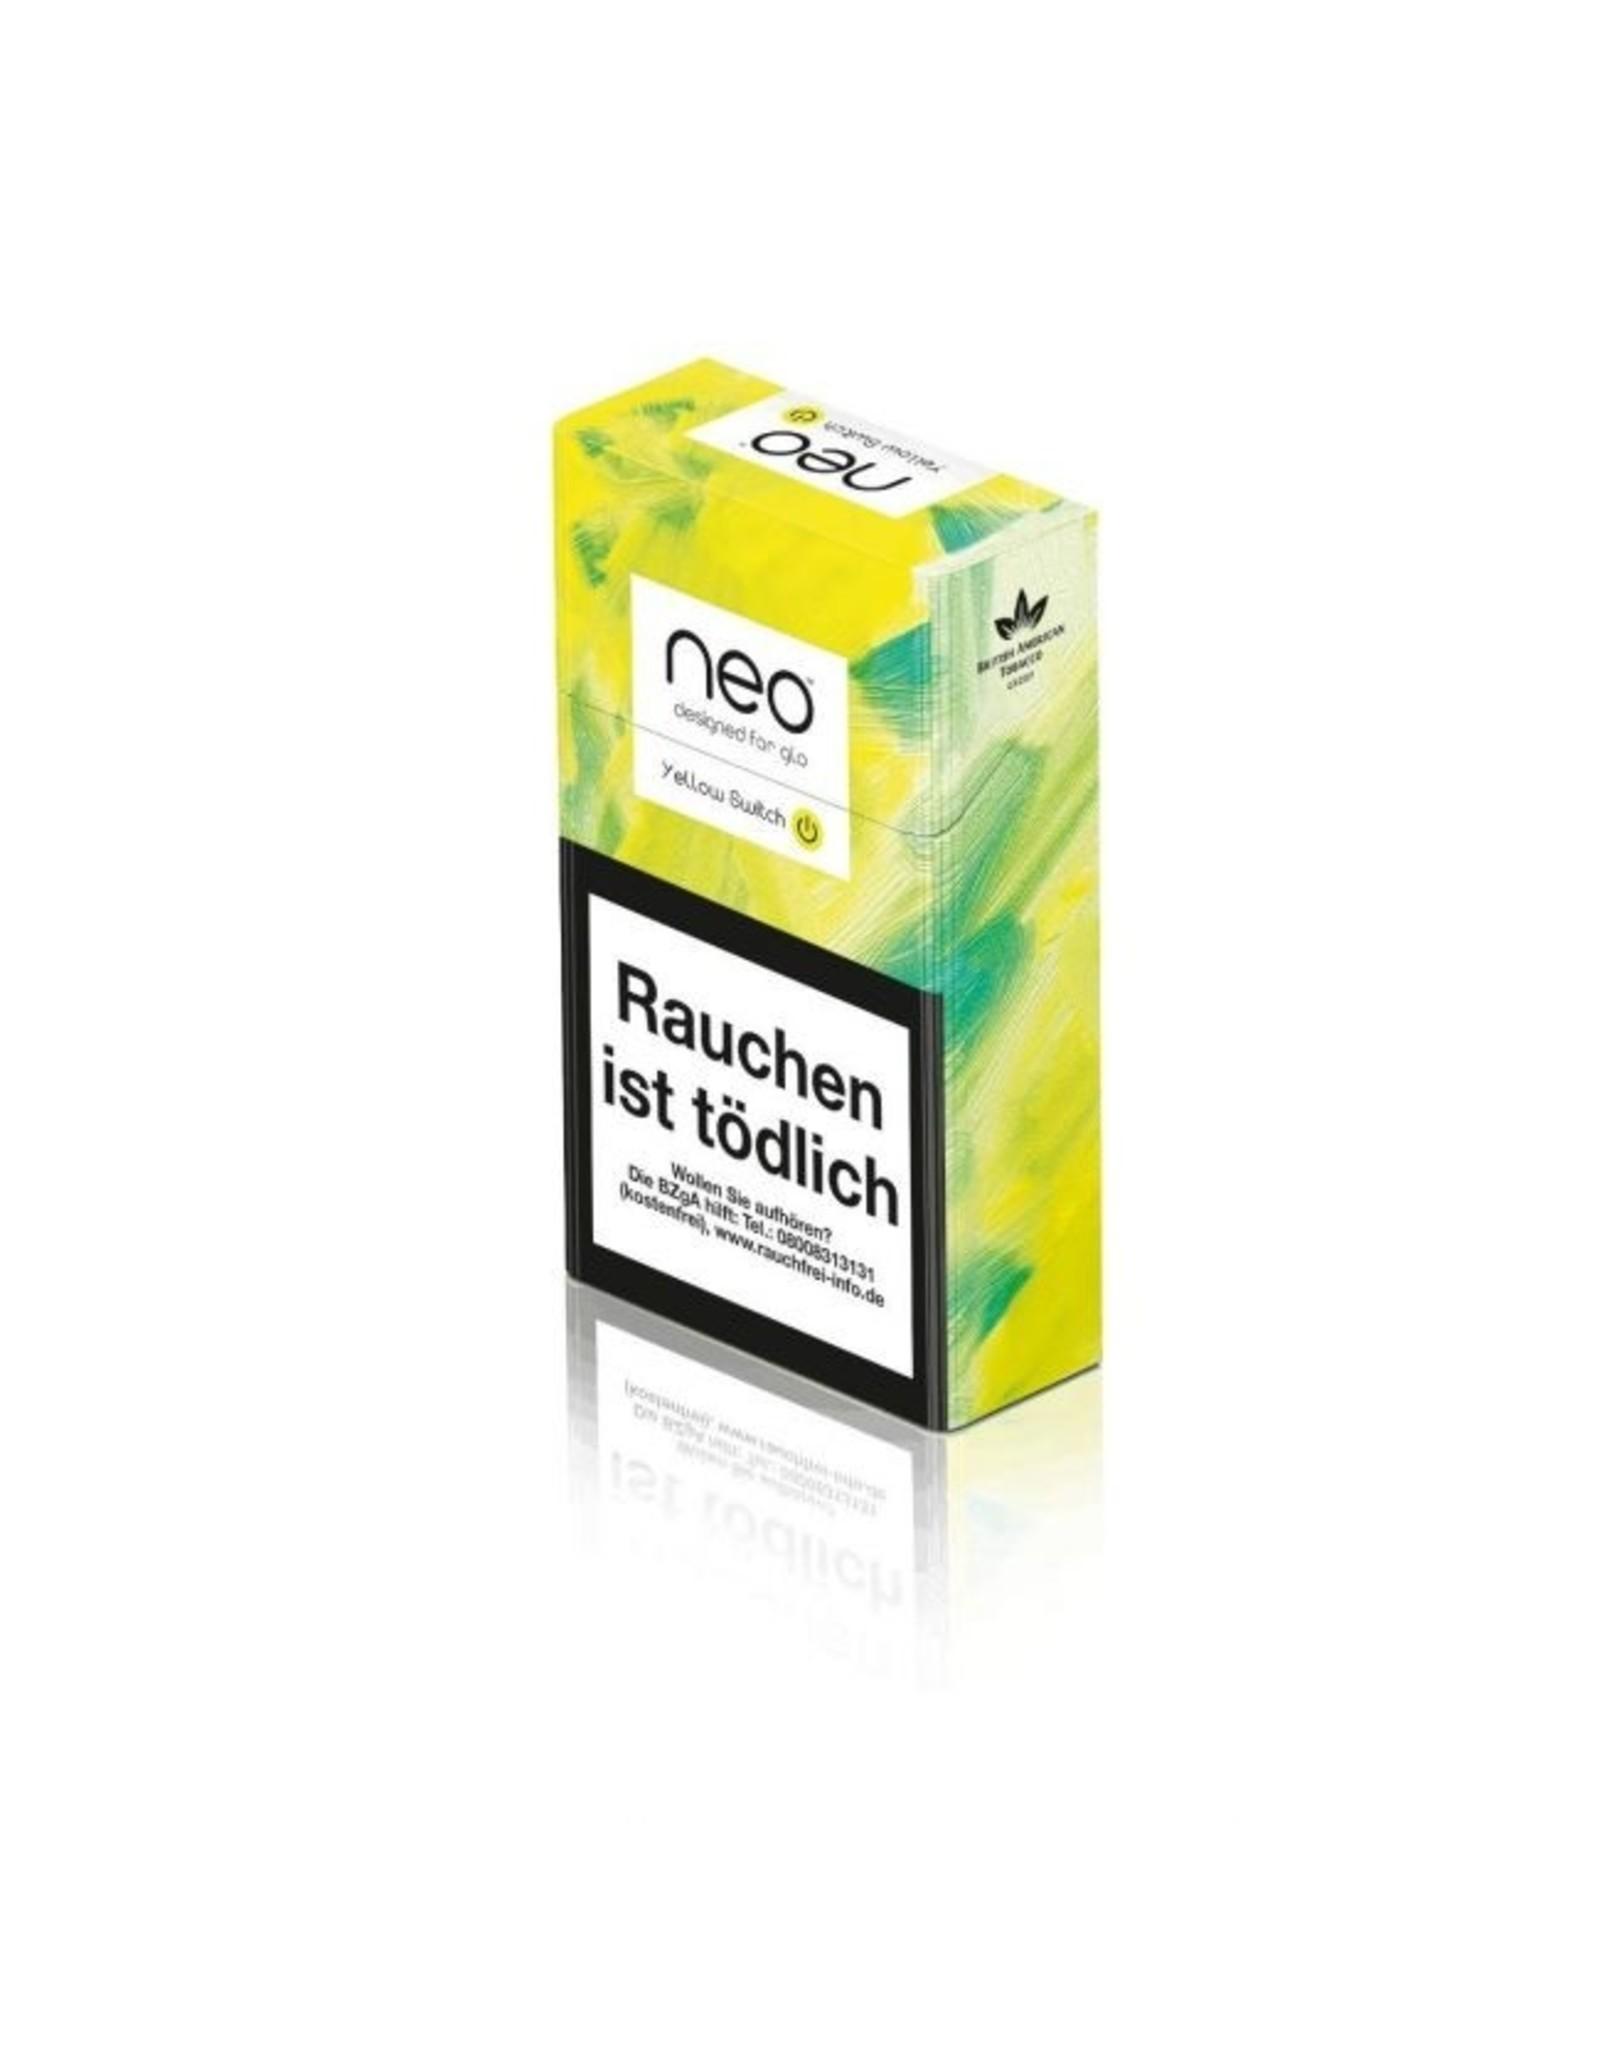 GLO NEO Yellow Switch - Tabak Sticks Einzelpackung